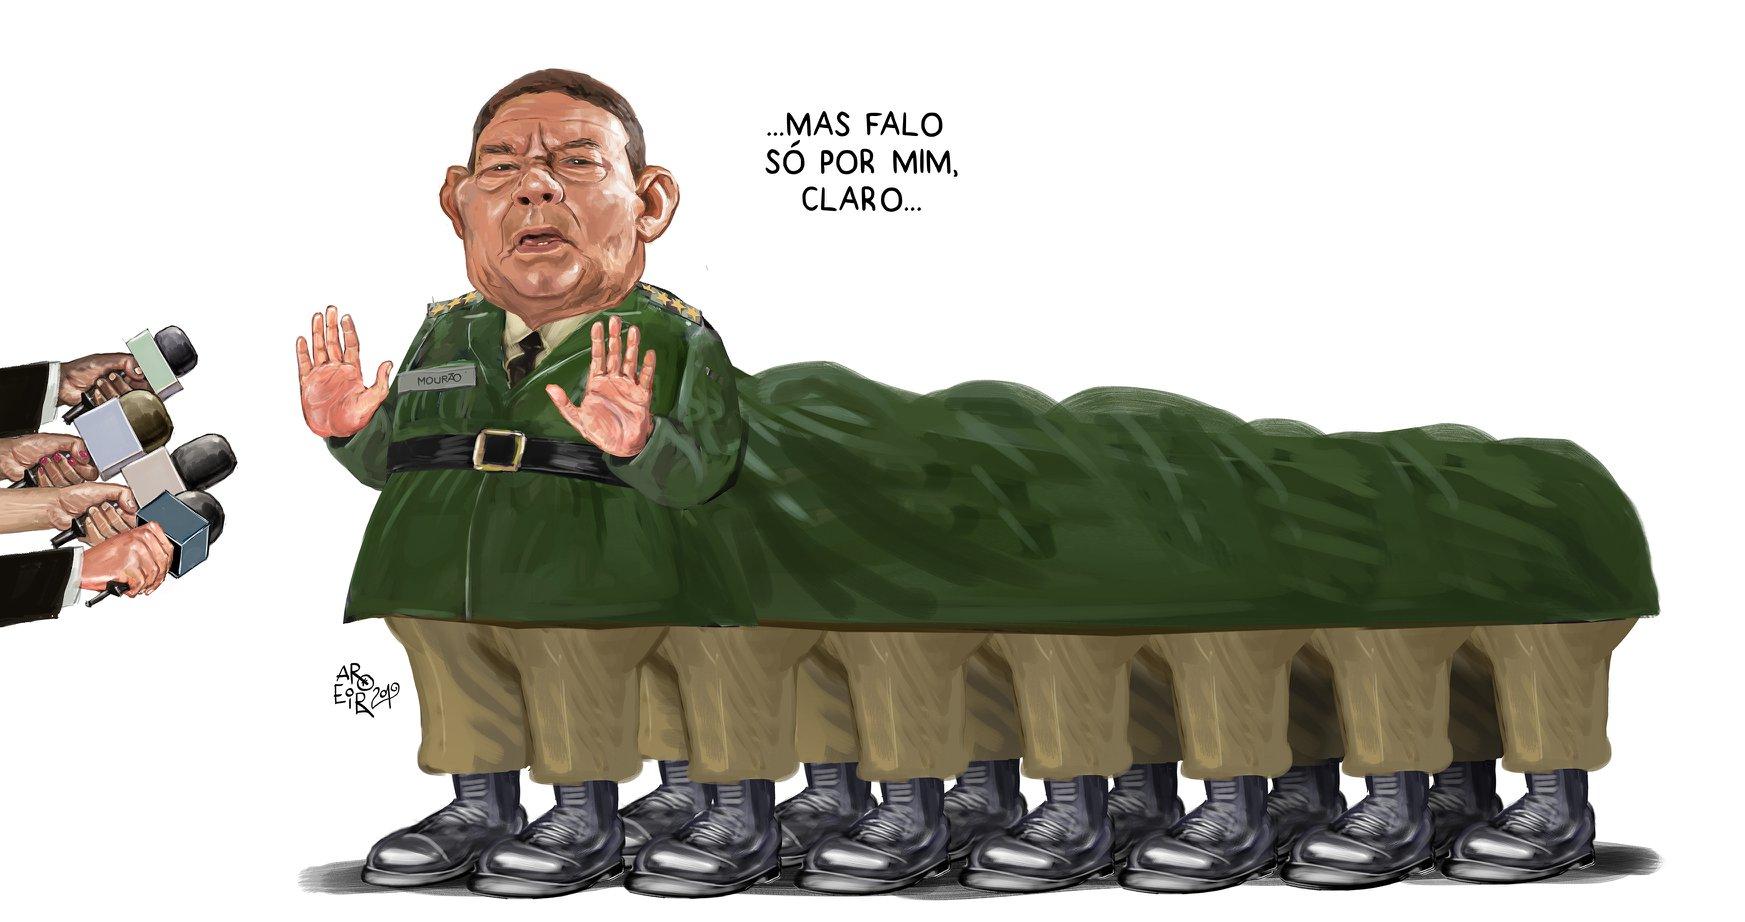 Porta voz de militares e banqueiros, Estadão publica editorial demolidor contra Bolsonaro